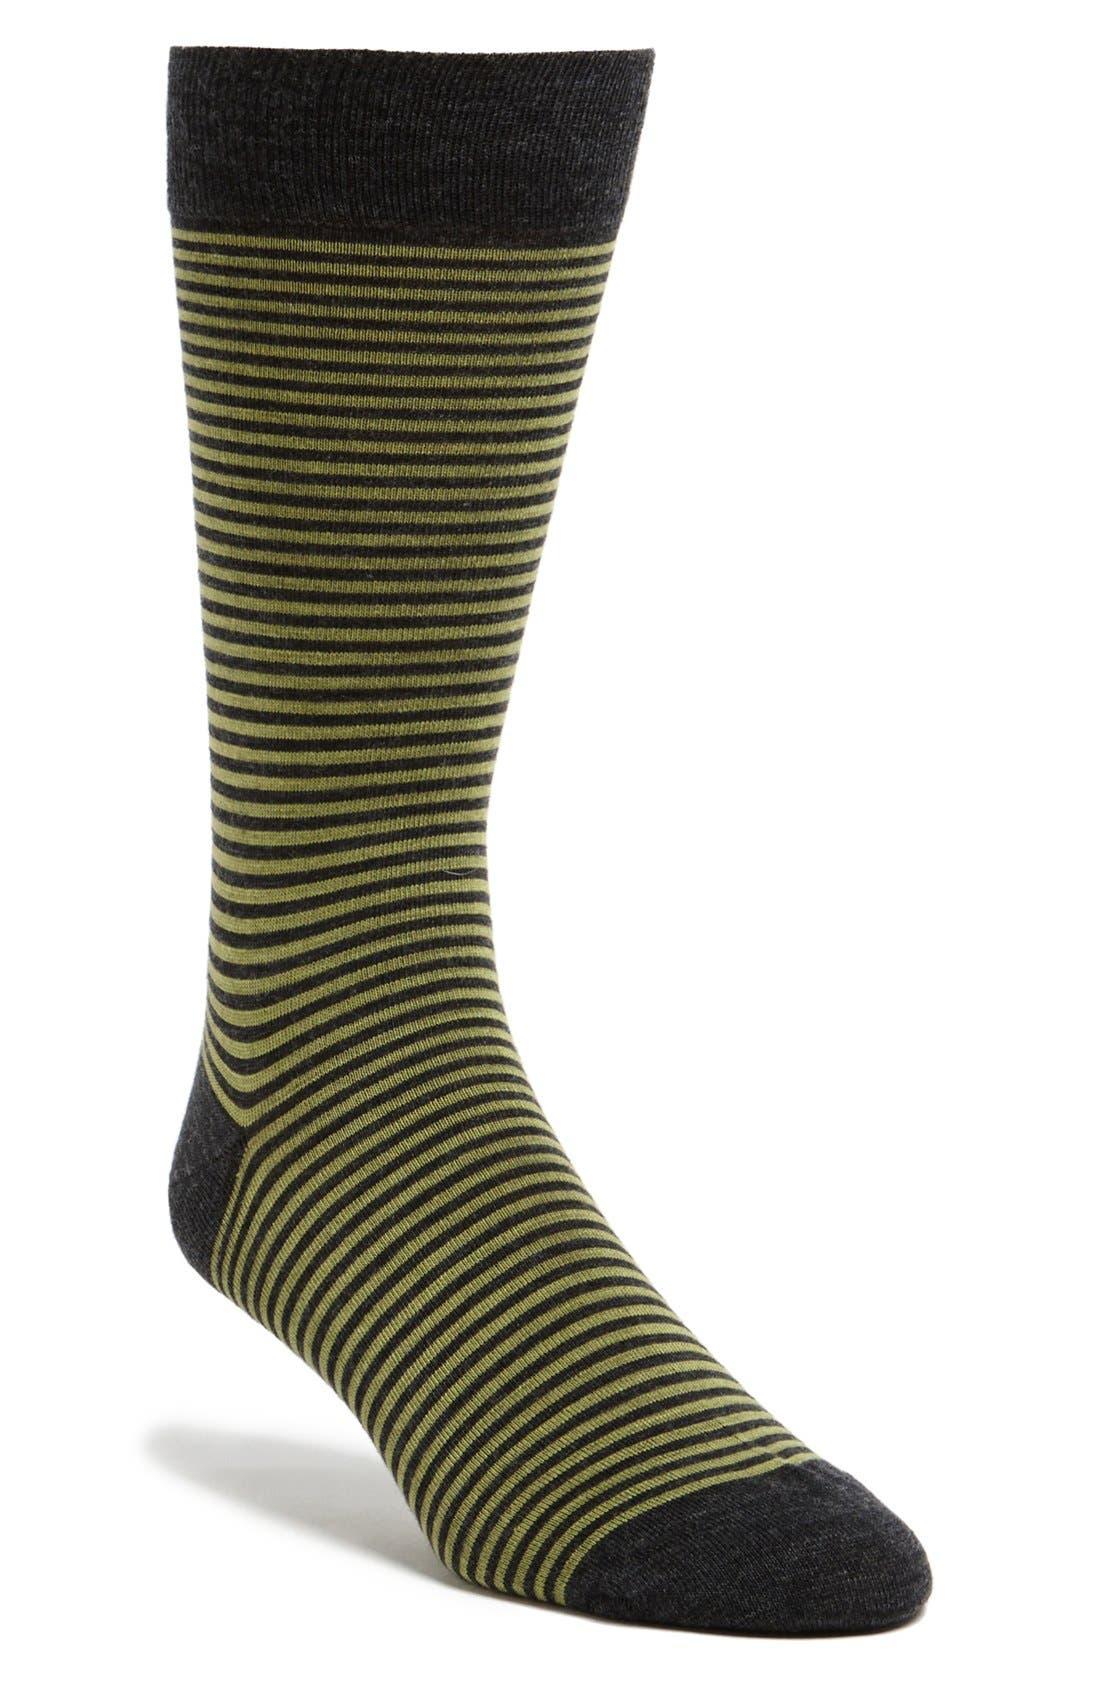 Alternate Image 1 Selected - Pantherella 'Whitechapel' Stripe Socks